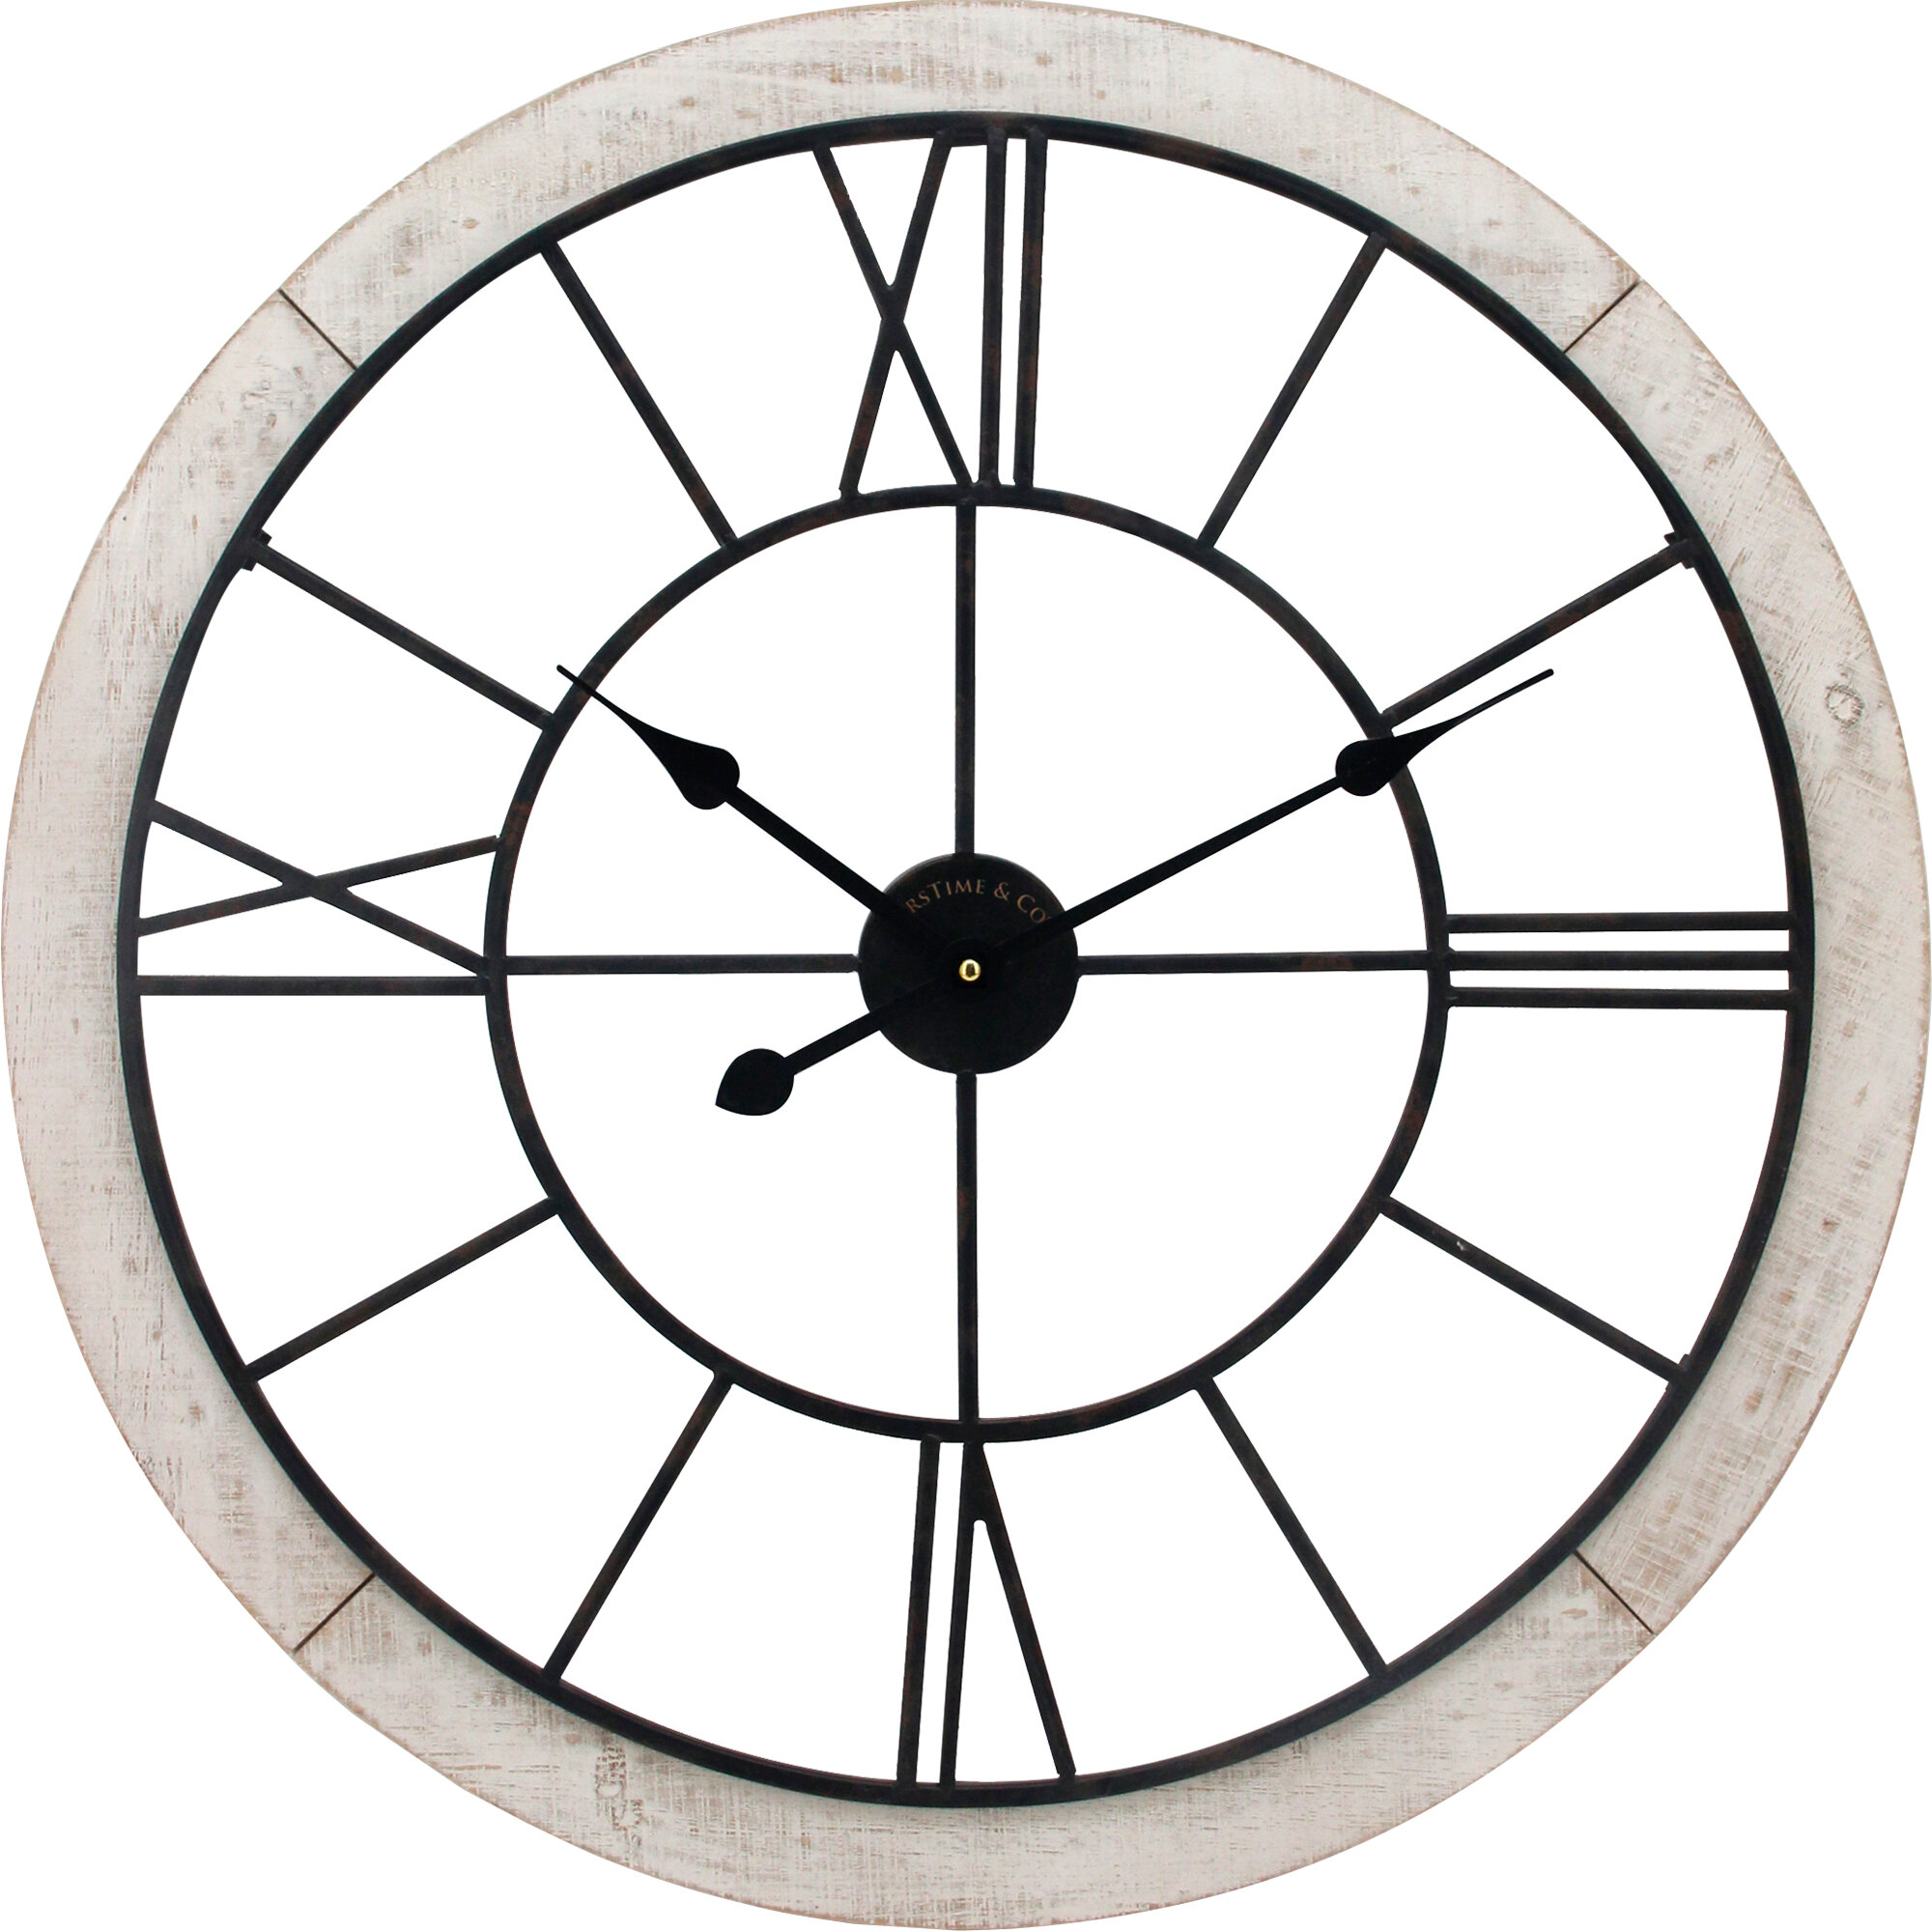 Grosse Horloge Fer Forgé horloge murale surdimensionnée 27 po valeur délavé elsner